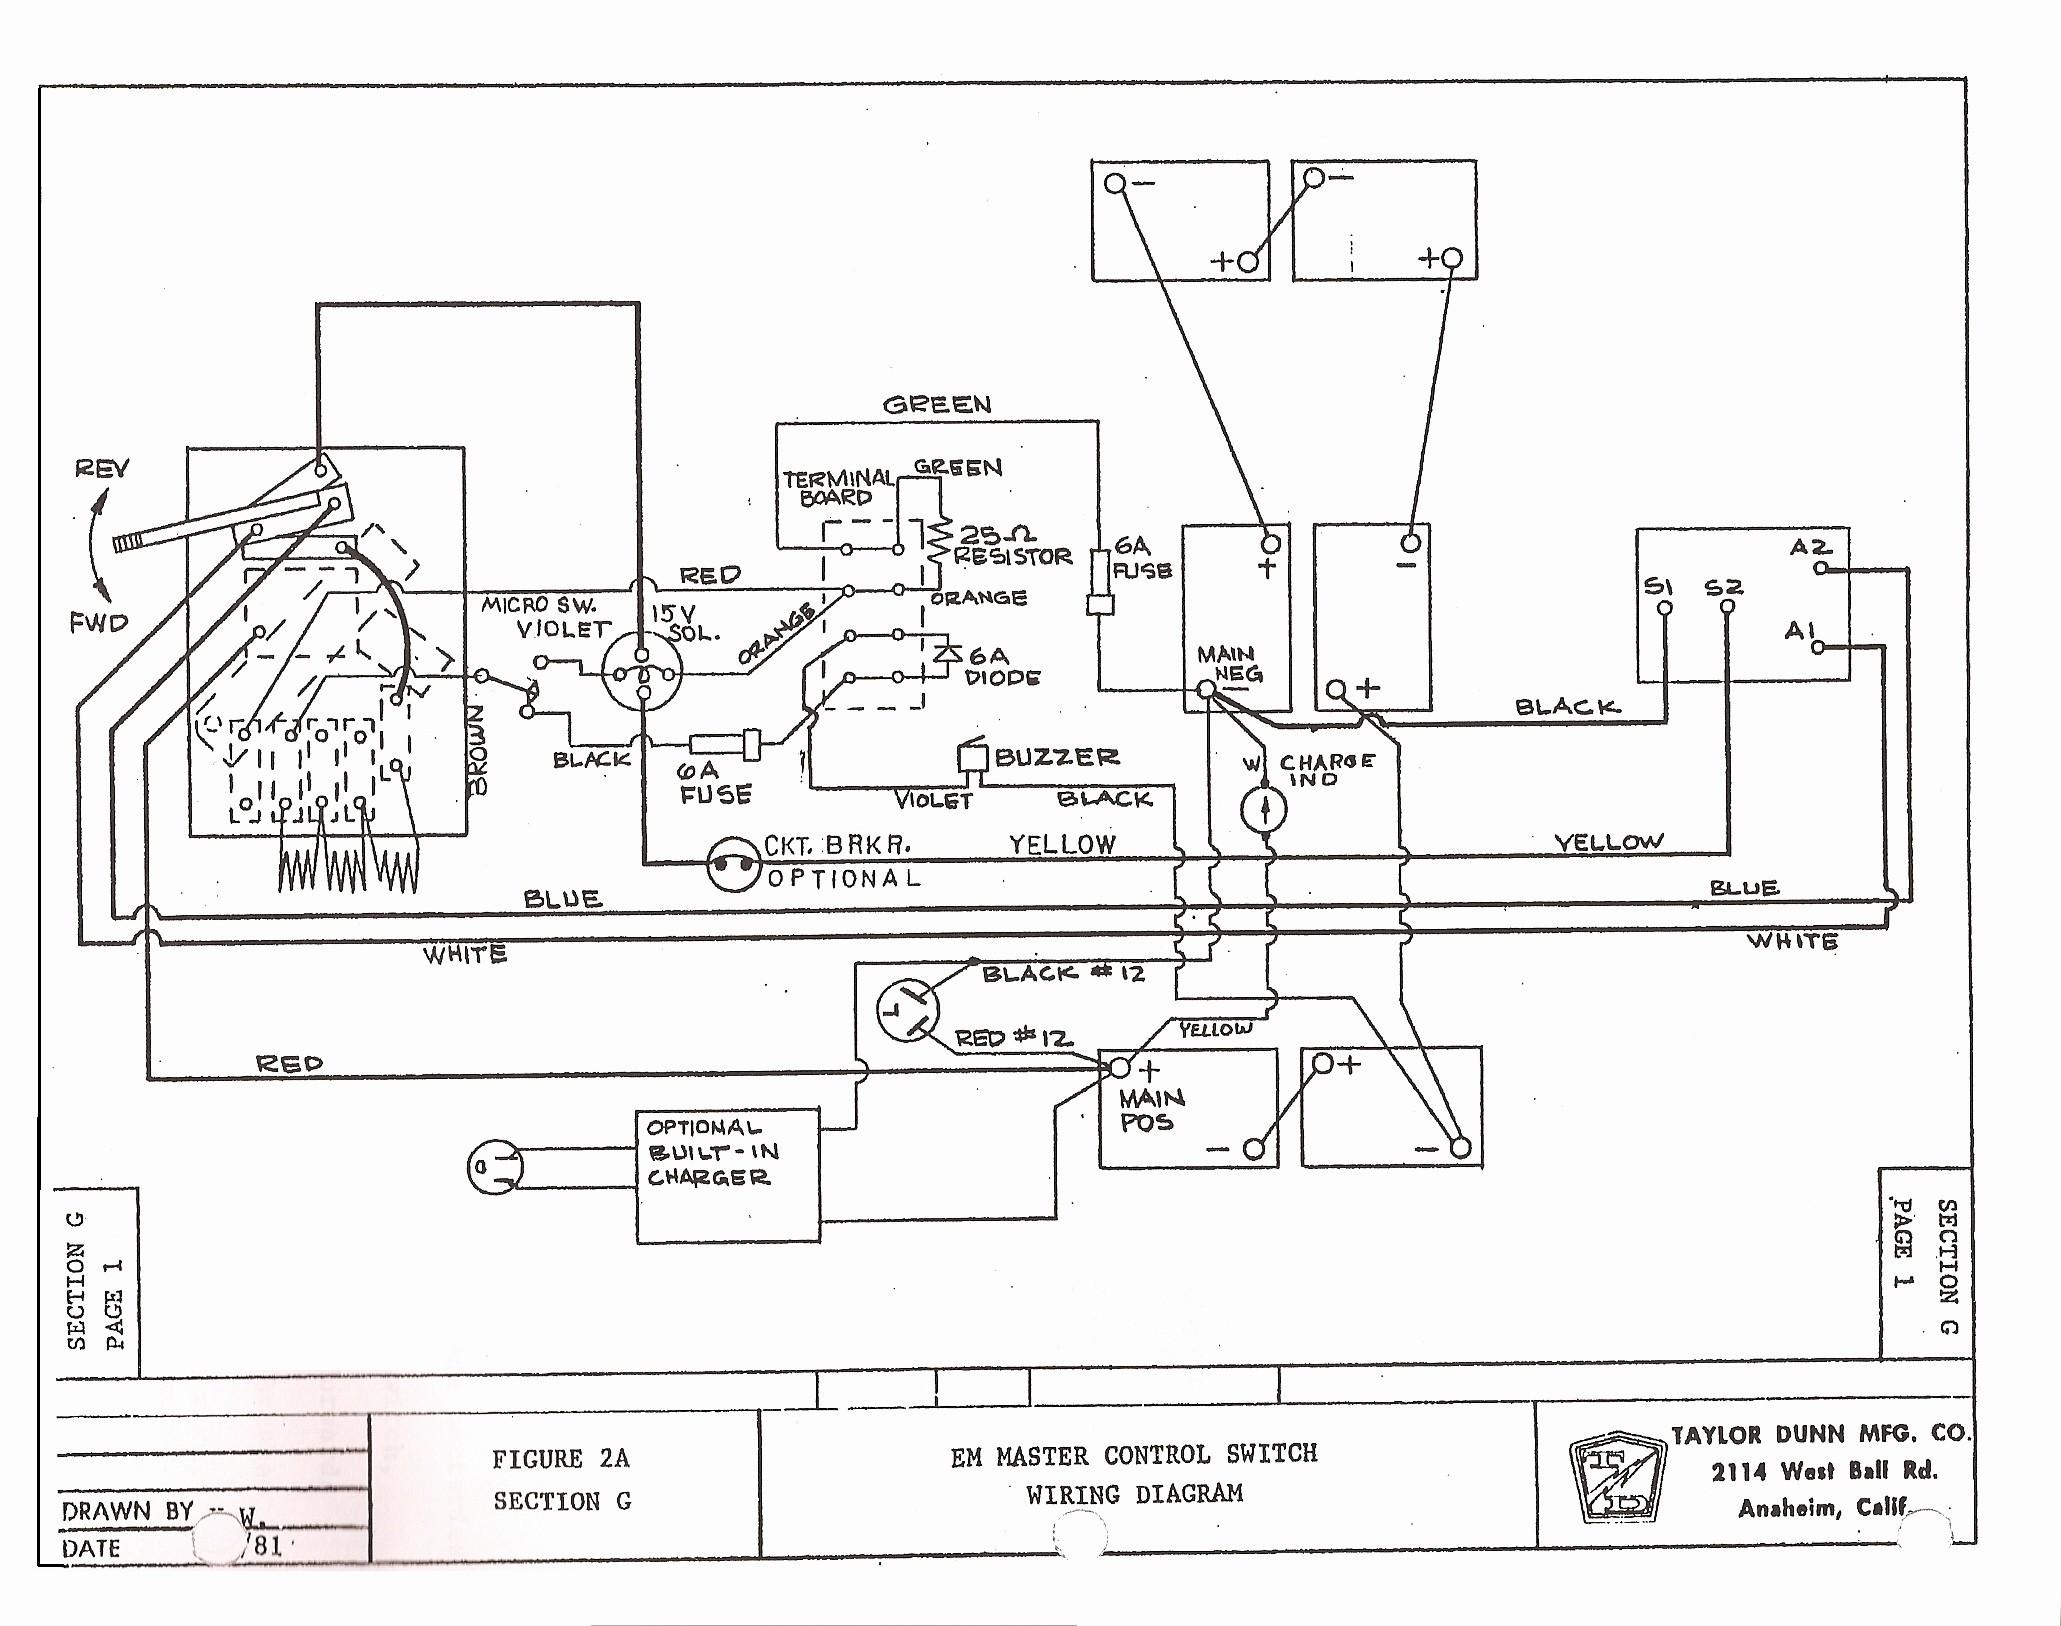 1995 Ez Go Medalist Wiring Diagram